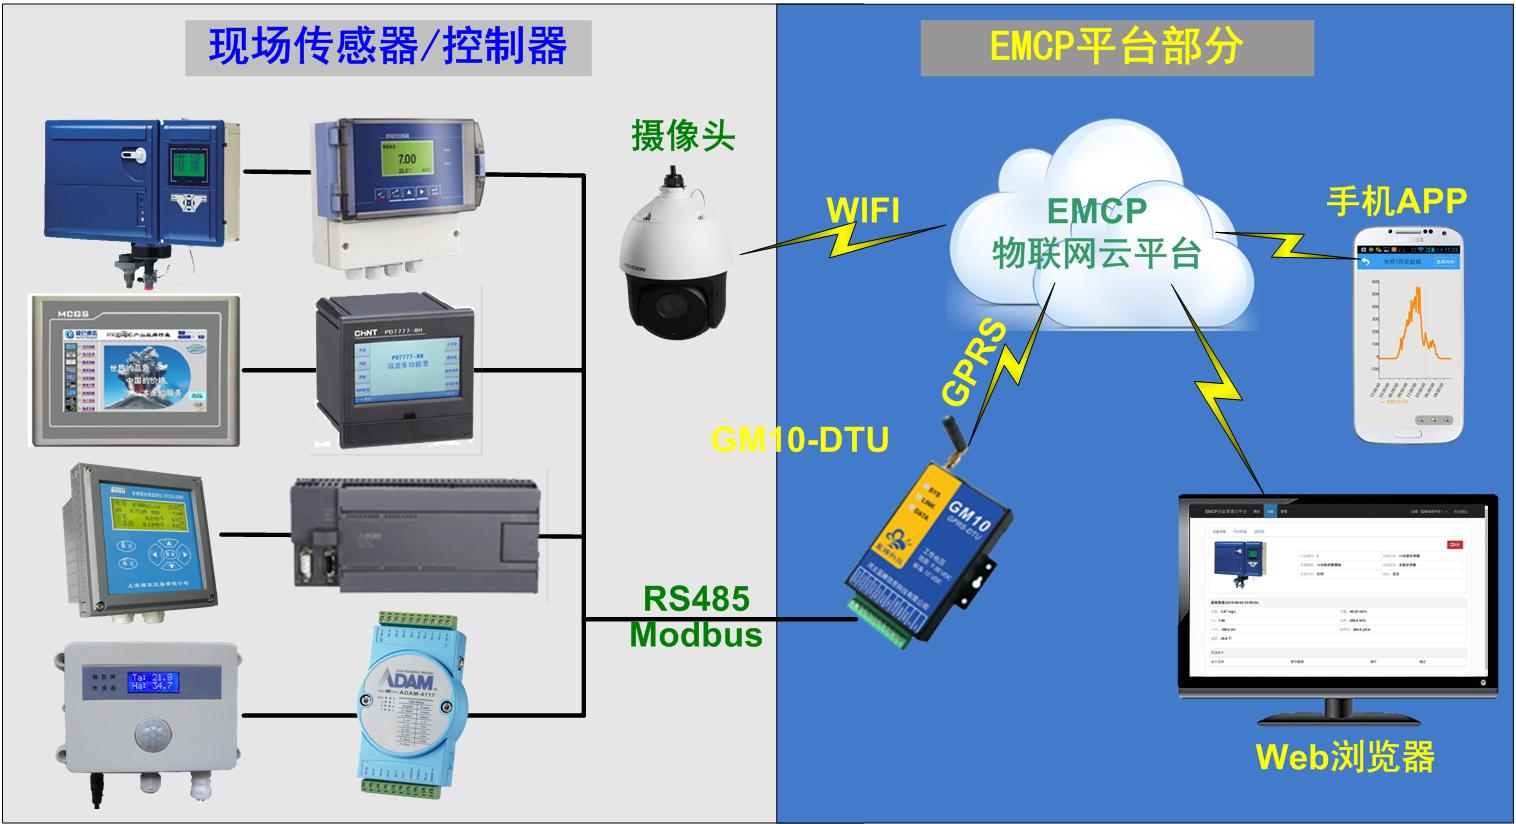 EMCP物联网云平台让远程监控安全精准无忧